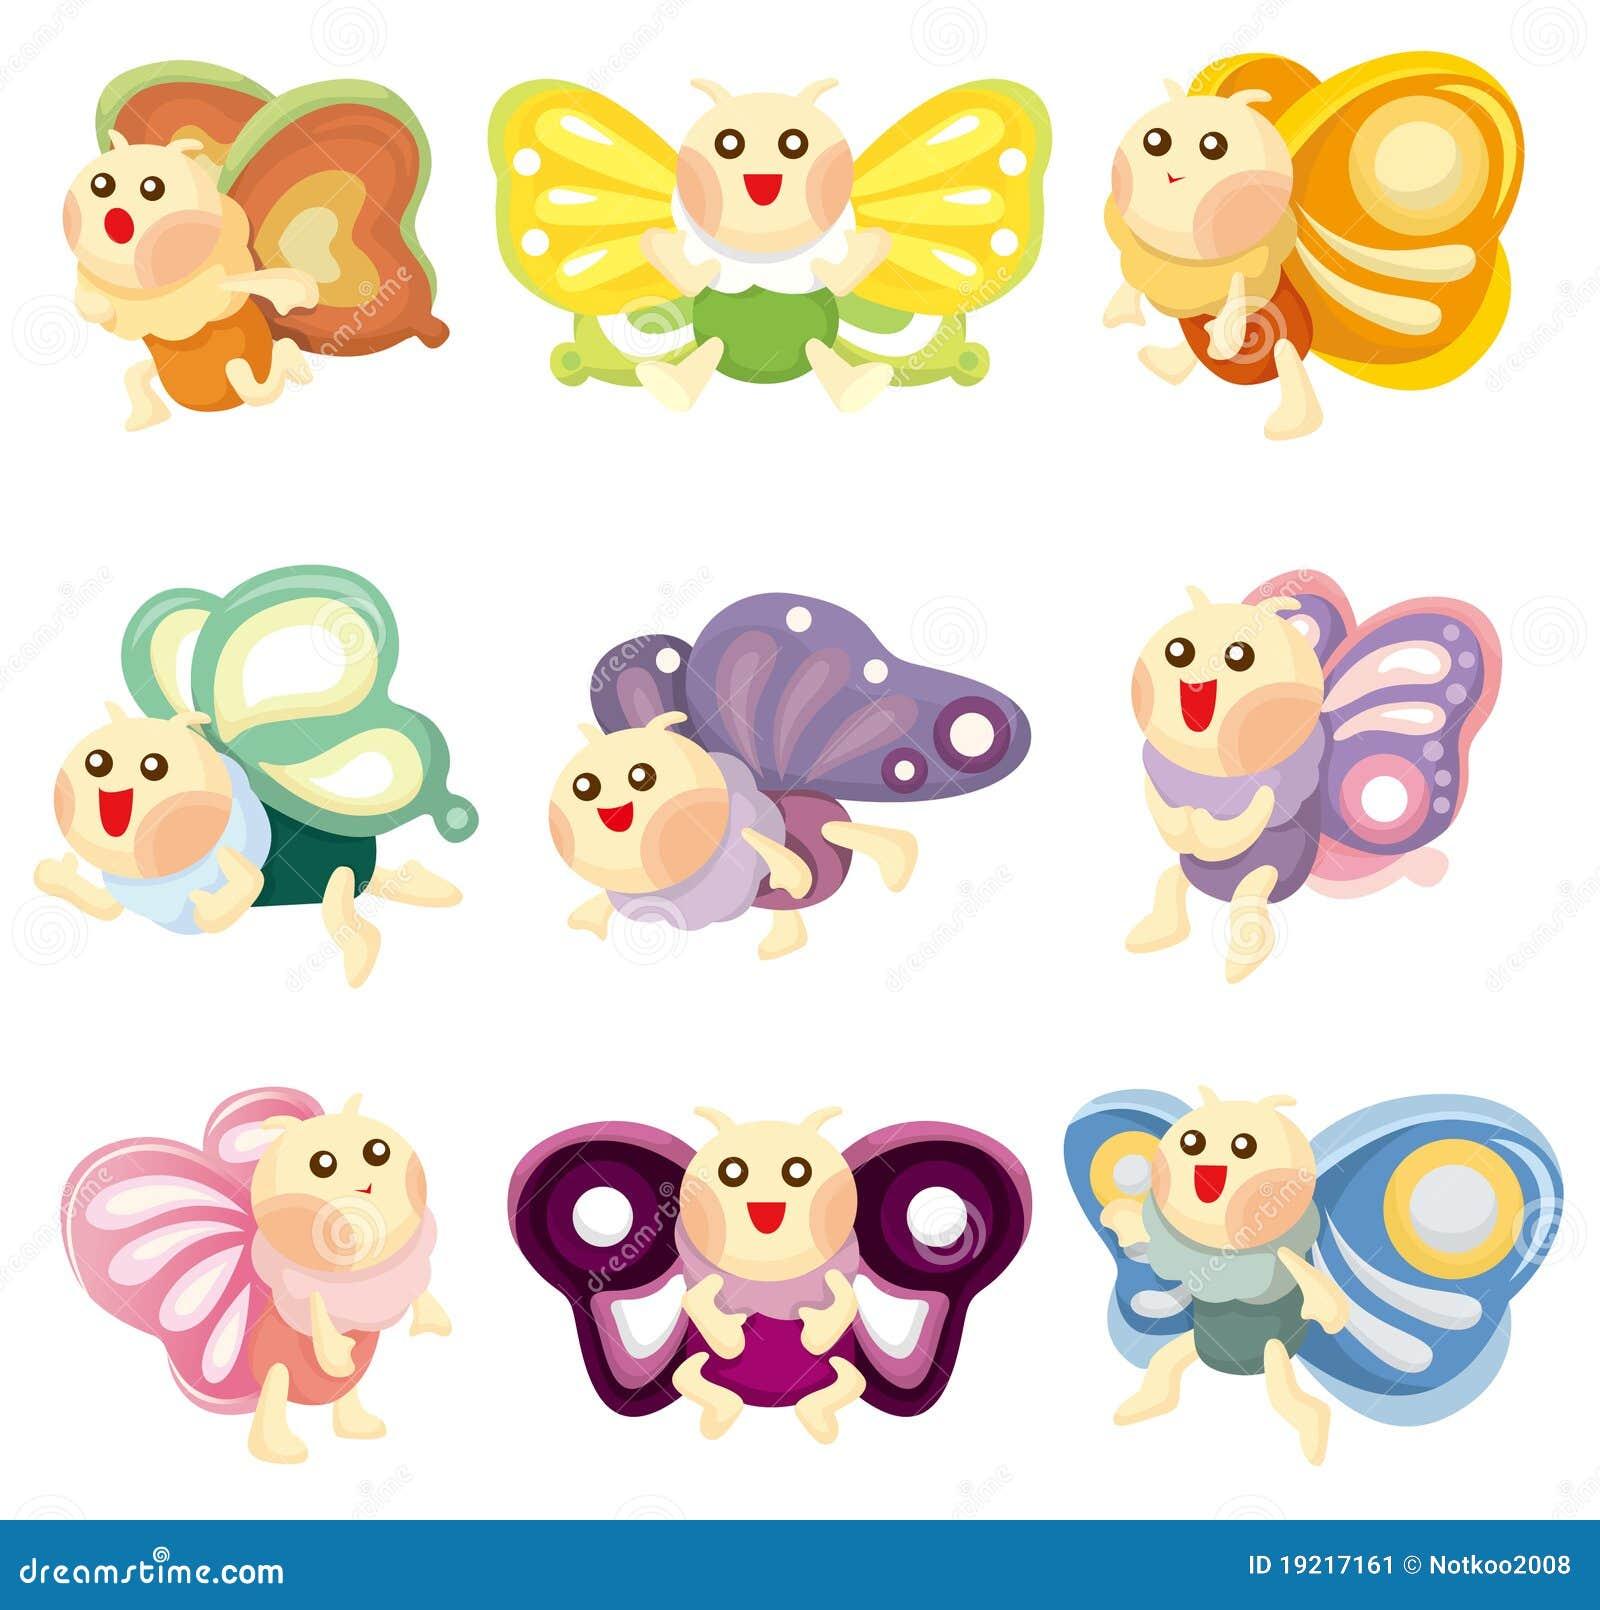 Cartoon Butterfly Icon Stock Vector Illustration Of Design